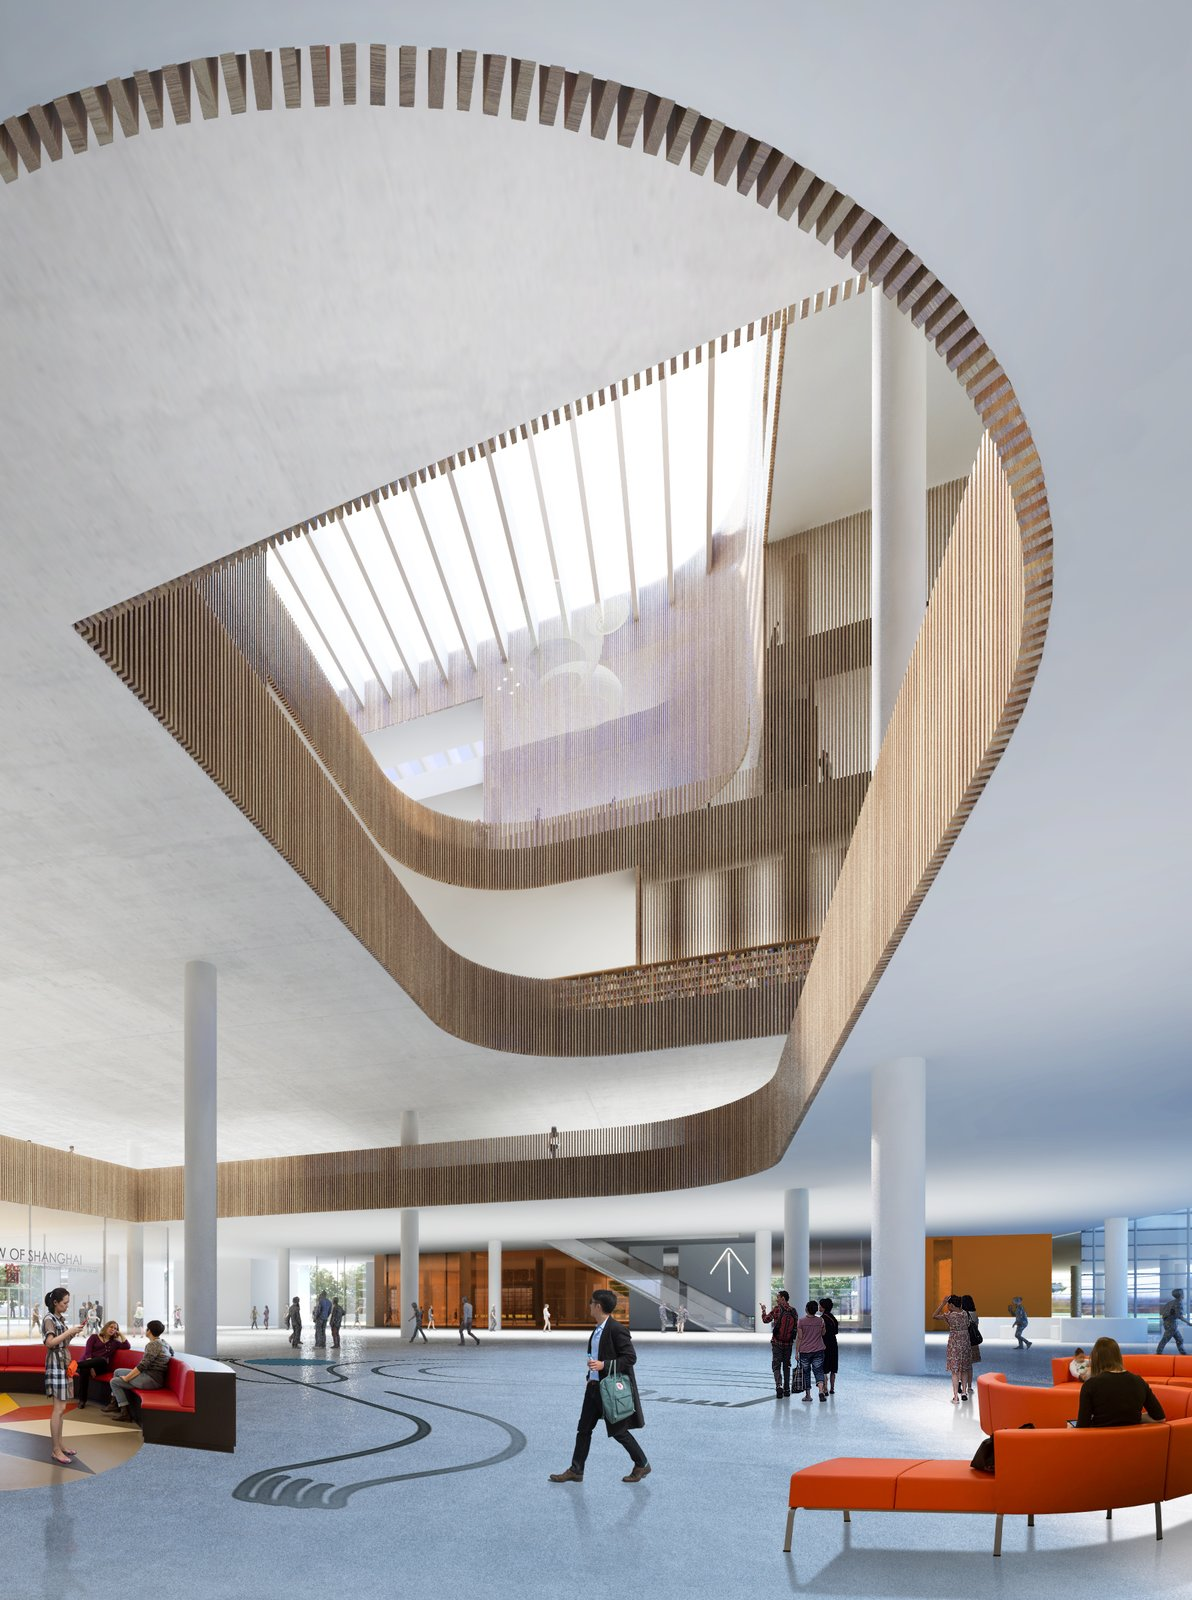 Photo 7 of 8 in Schmidt Hammer Lassen Architects' Winning Design For the Shanghai Library